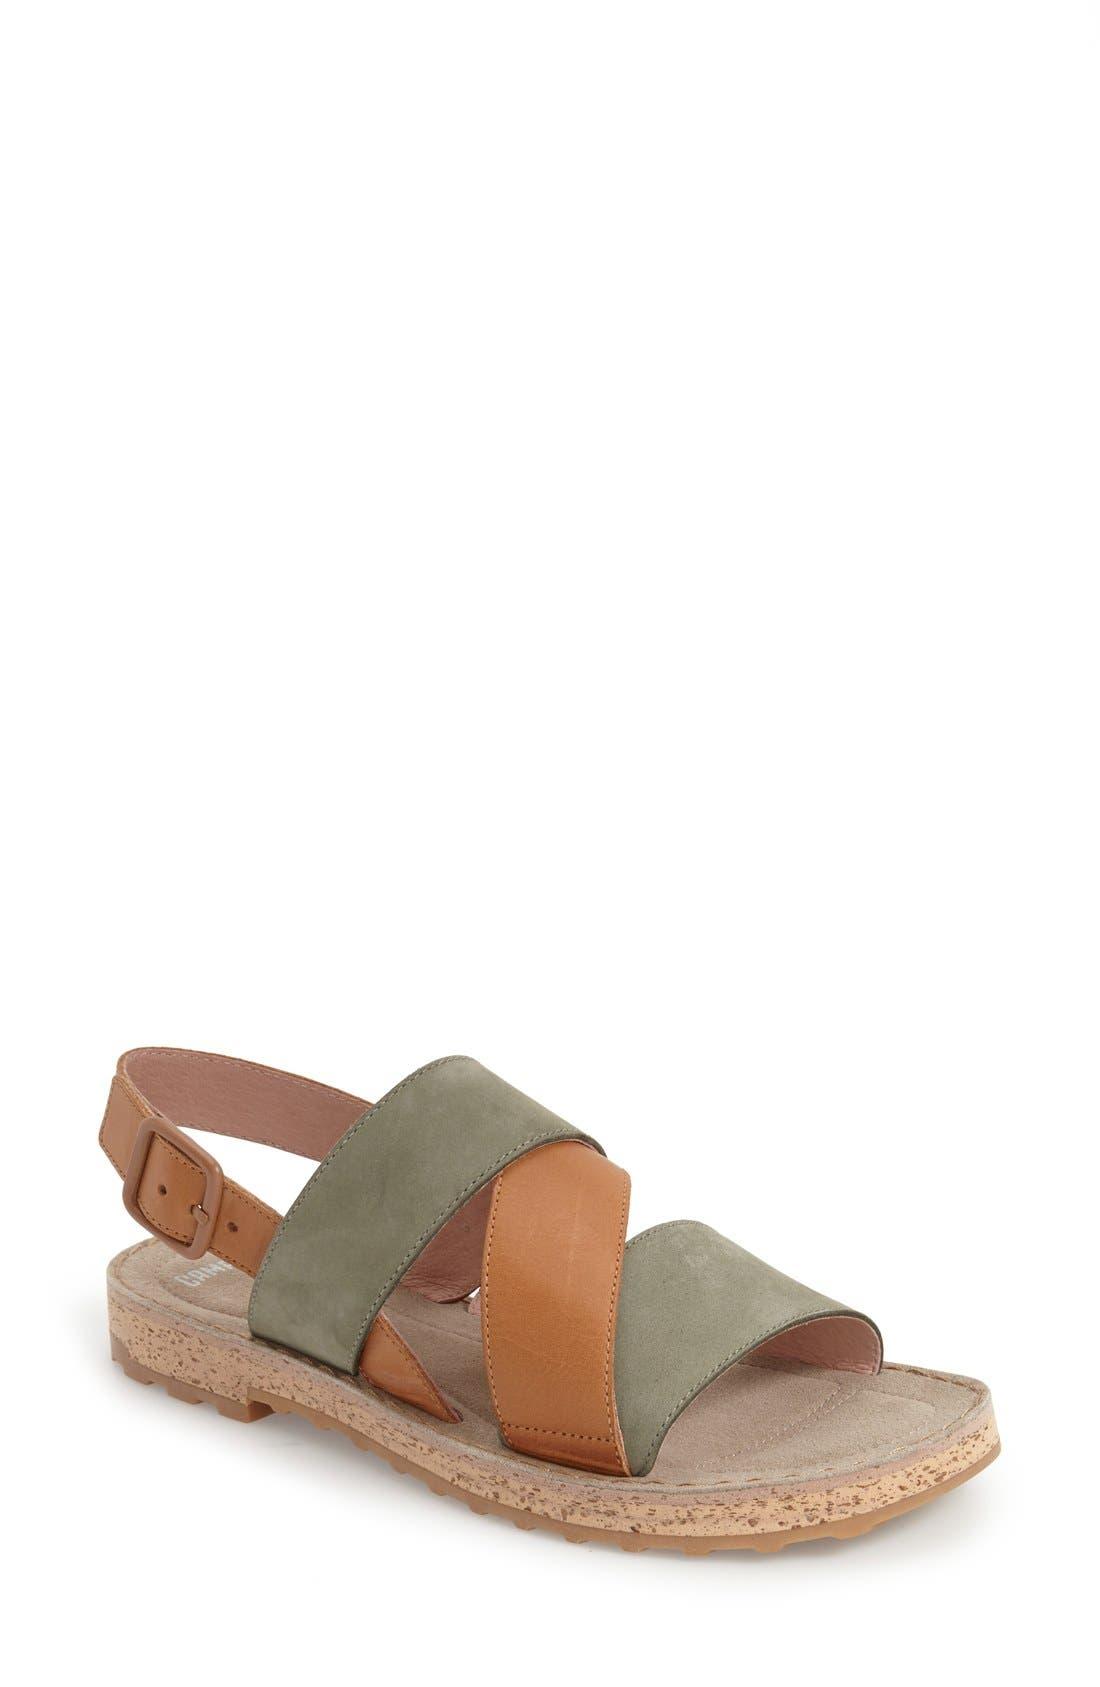 Main Image - Camper 'Pimpom' Leather & Suede Crisscross Strap Sandal (Women)